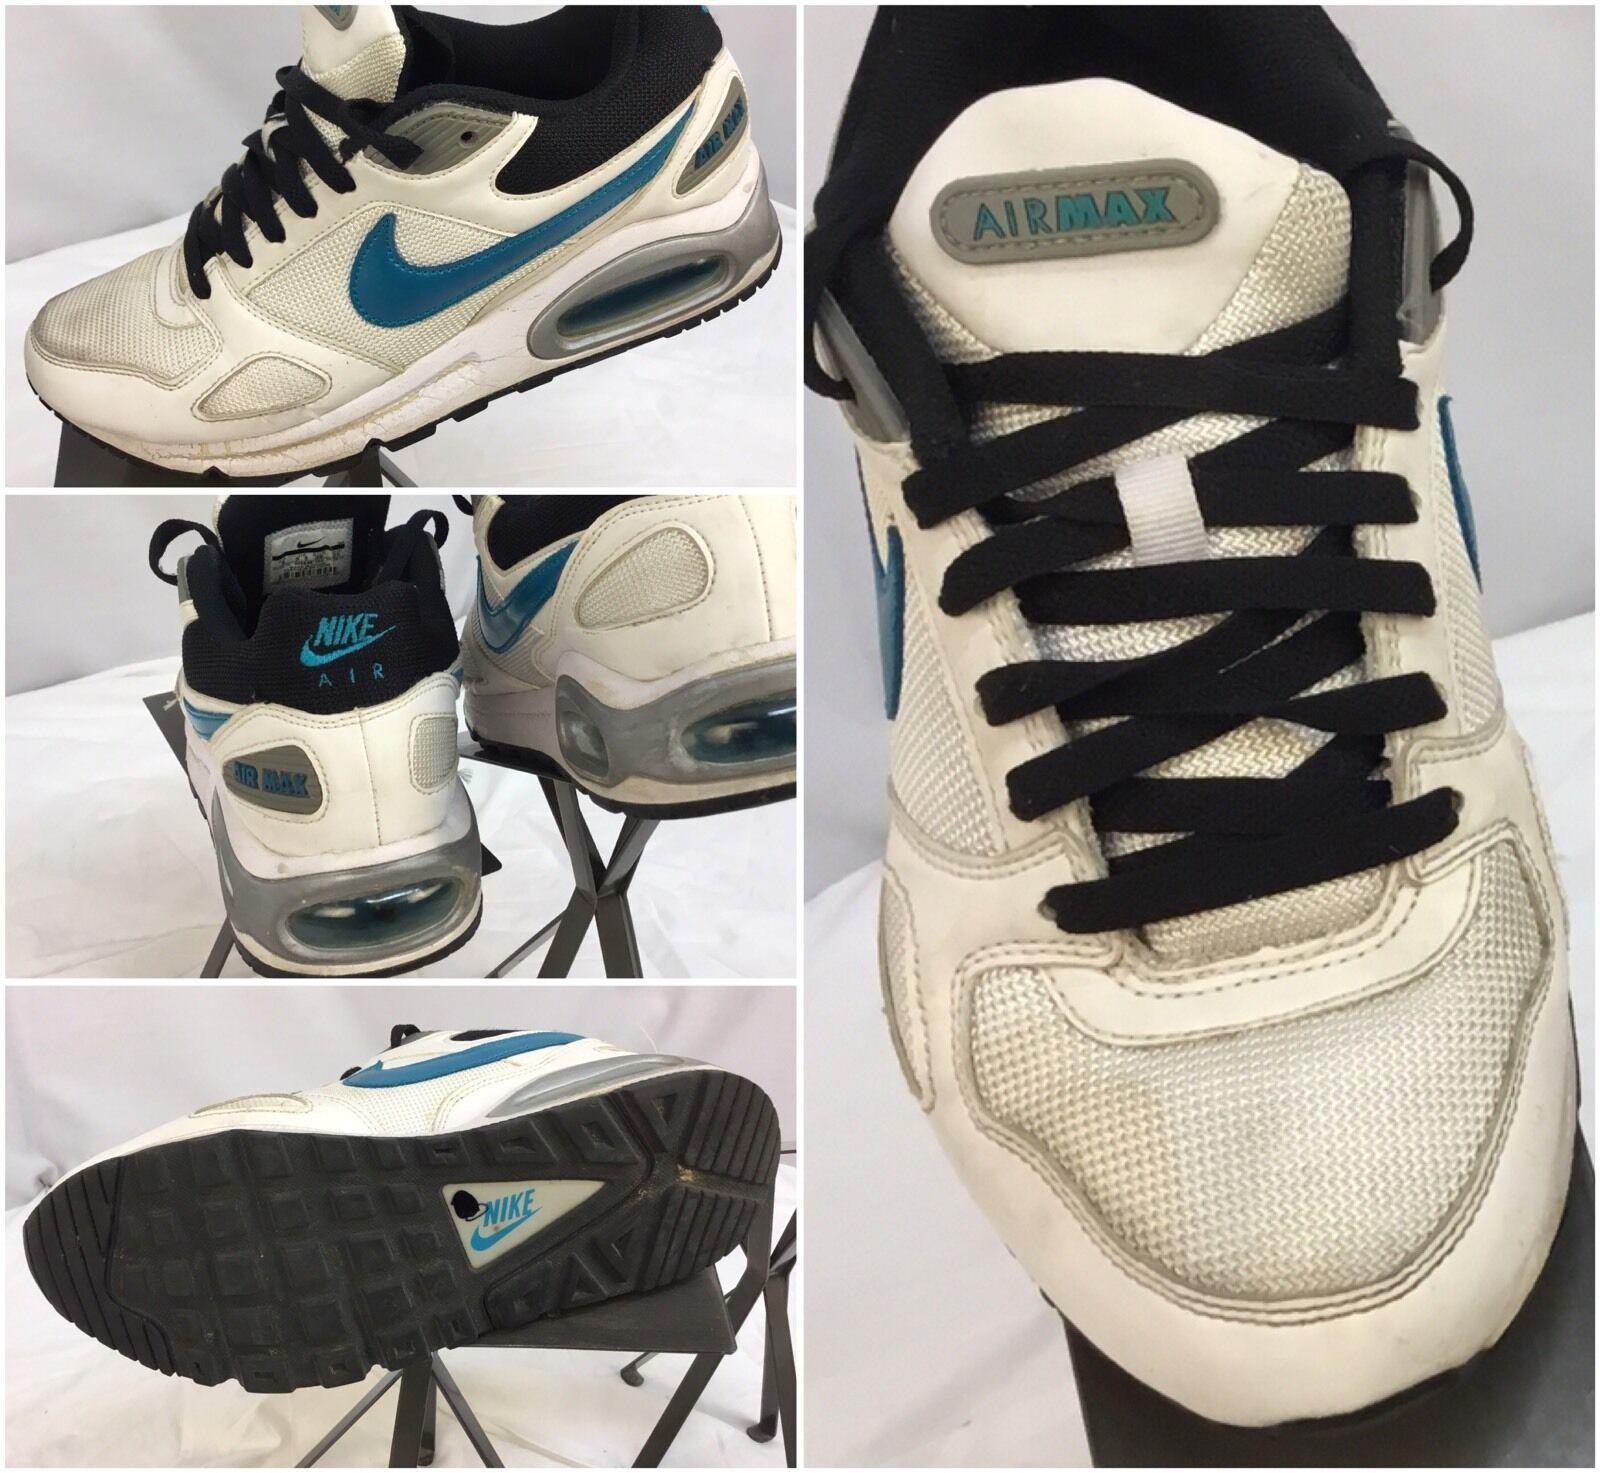 Nike Air Max Sz 8 Women Running Shoes White Blue Stripe EUC YGI C7-94